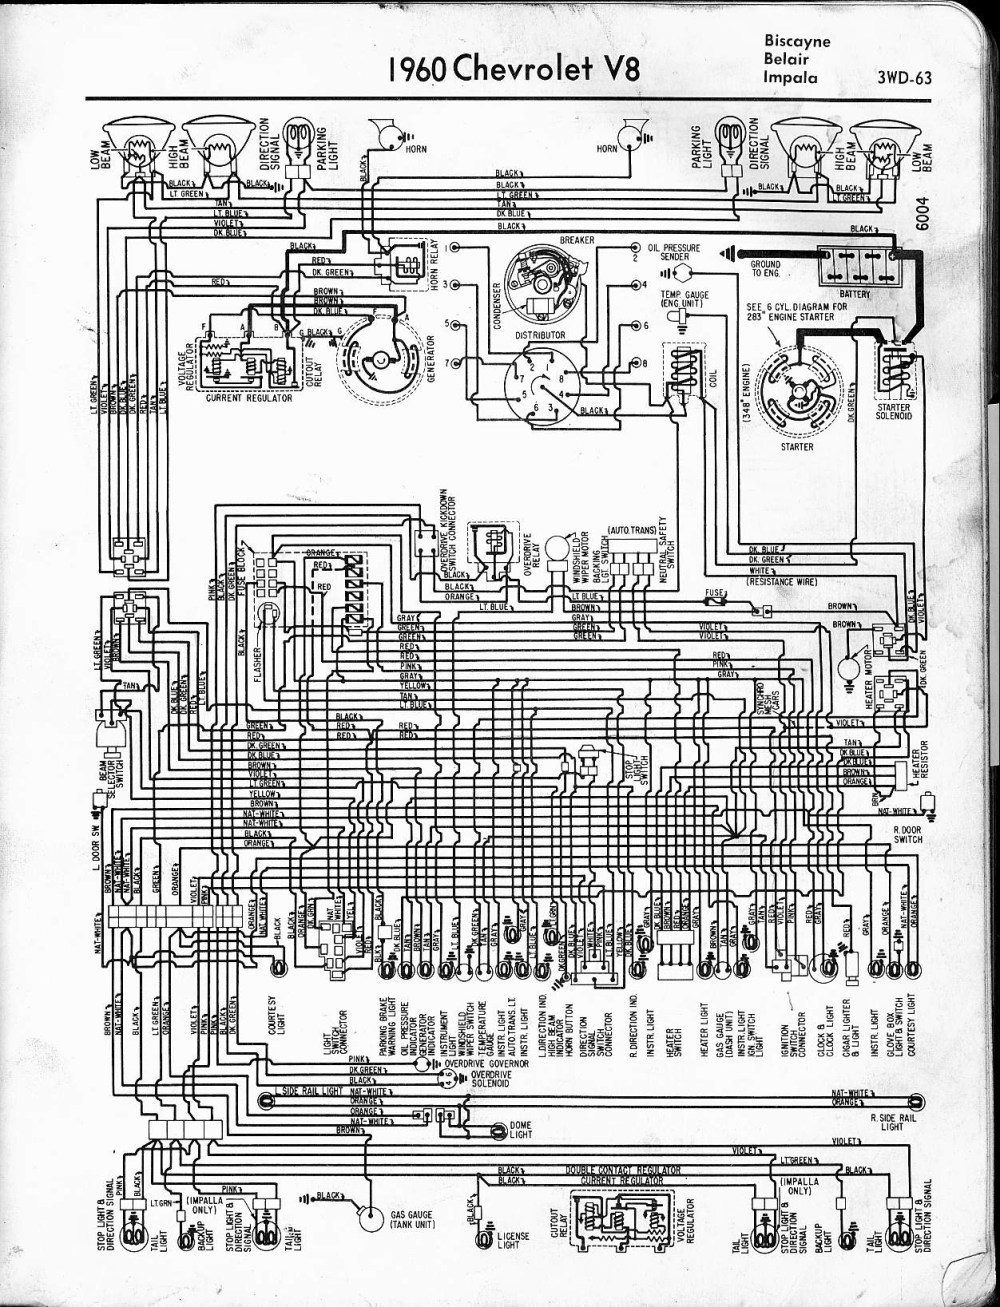 medium resolution of 2015 chevy silverado wiring diagram 1960 v8 biscayne belair impala 5c